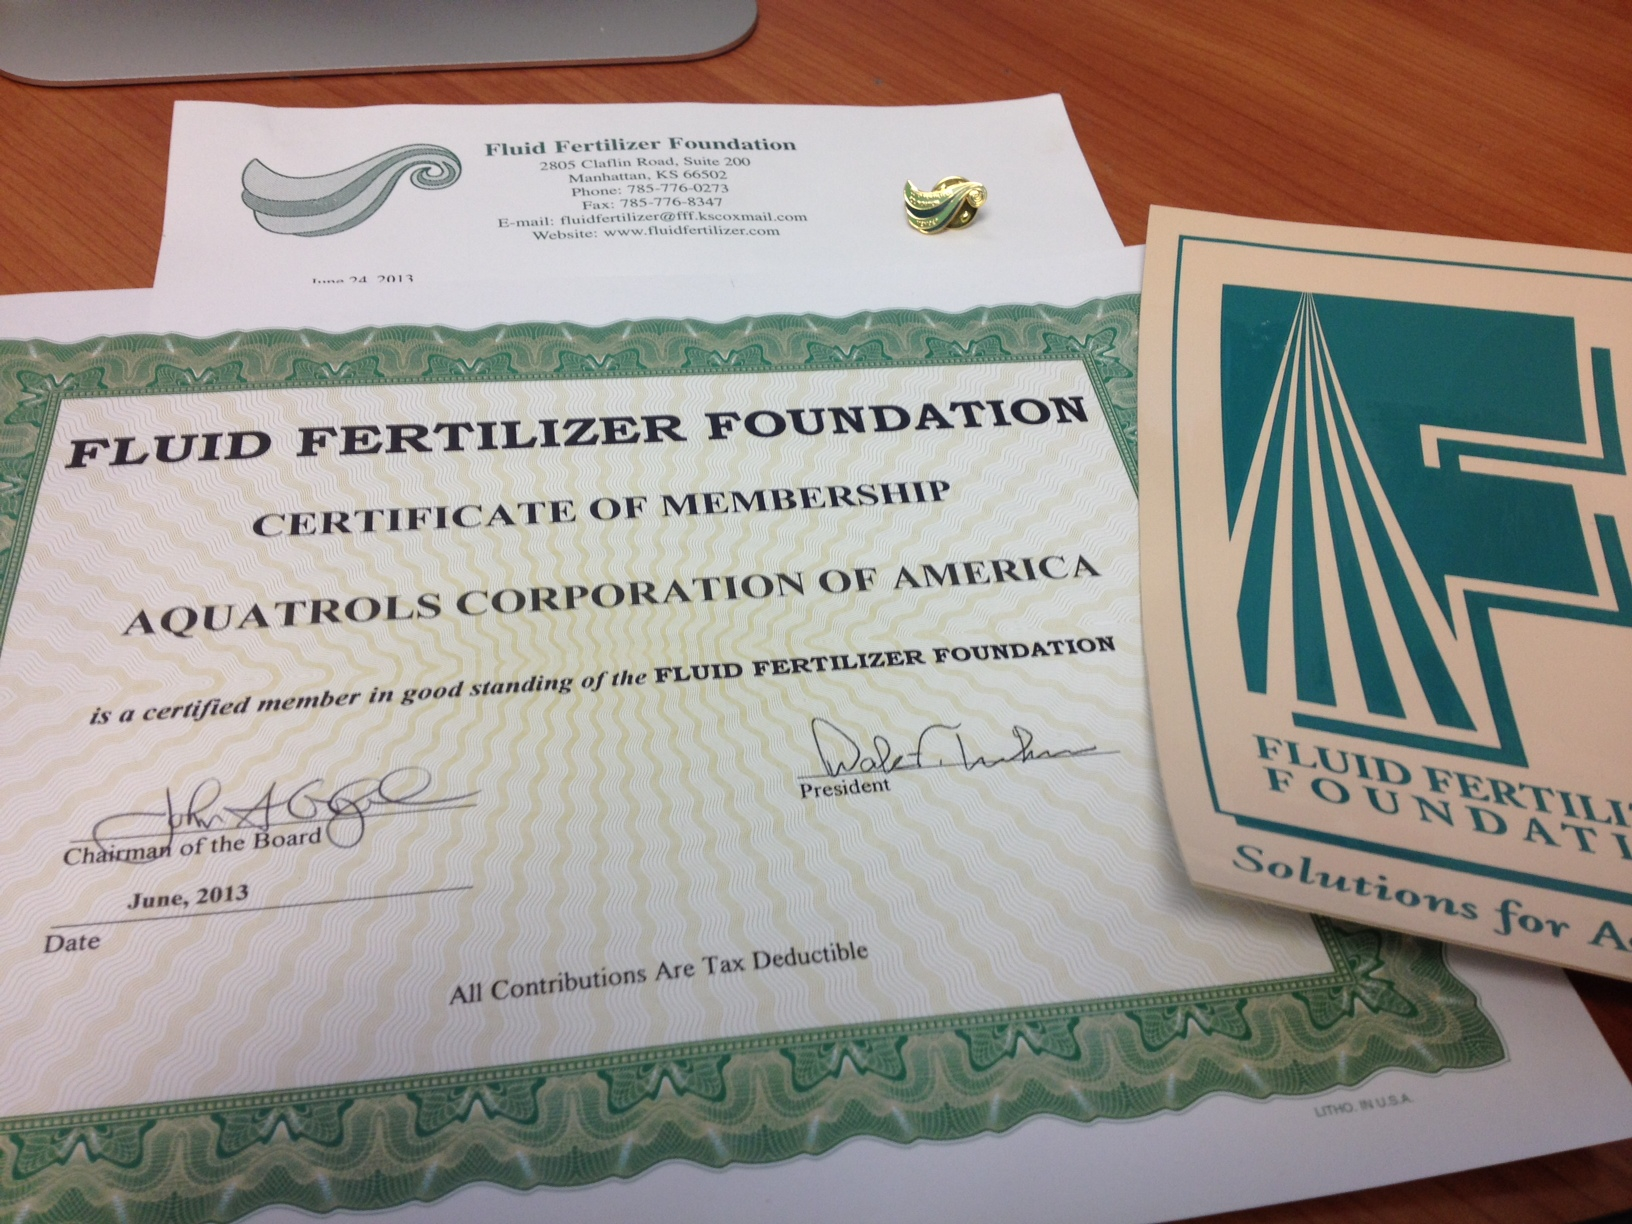 Fluid Fertilizer Foundation